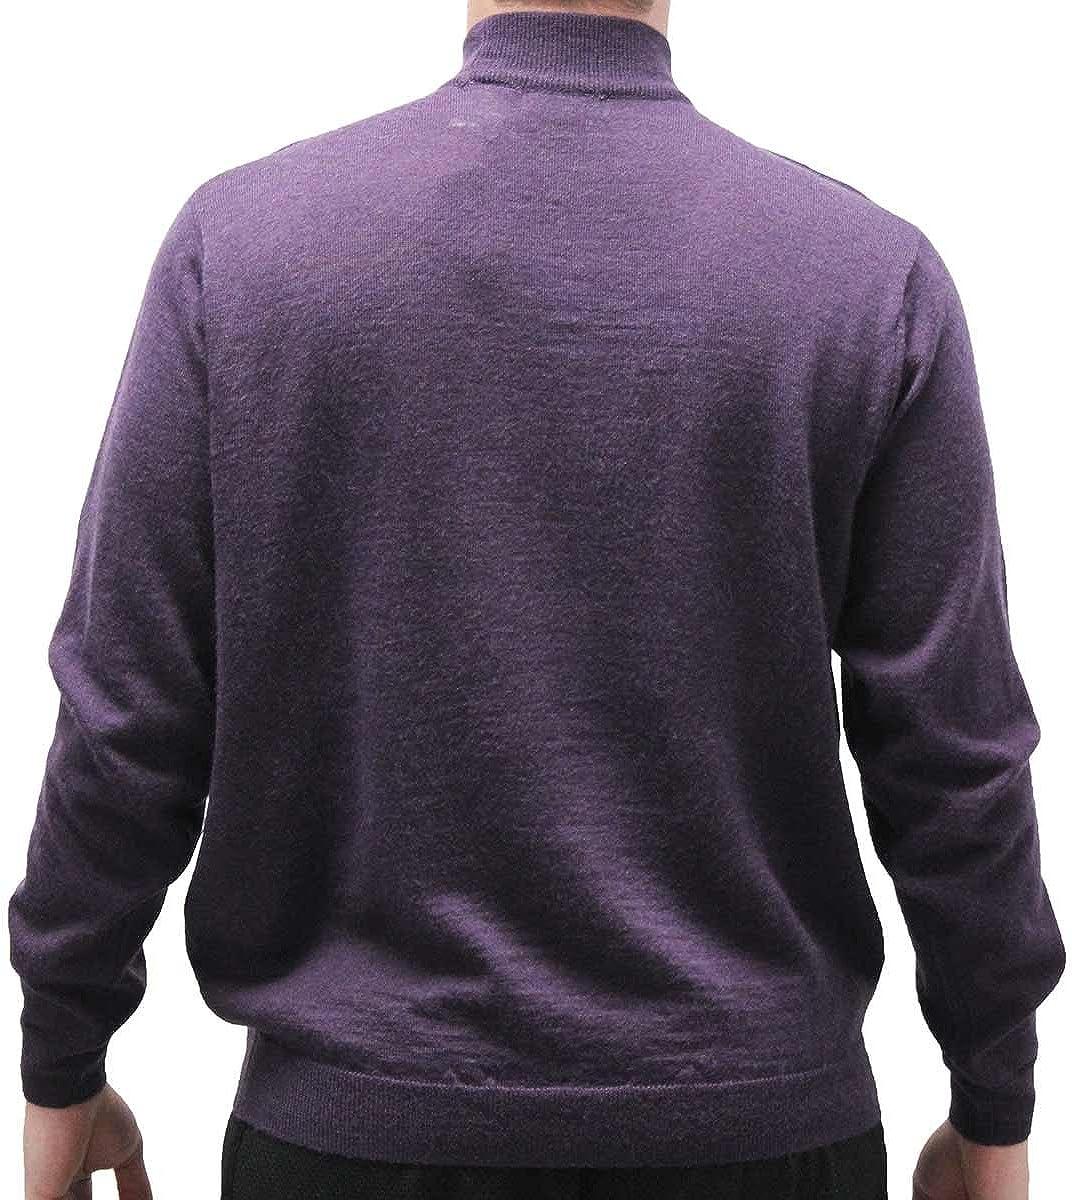 Cellinni Men's Solid Mock Turtleneck Sweater 6800-500